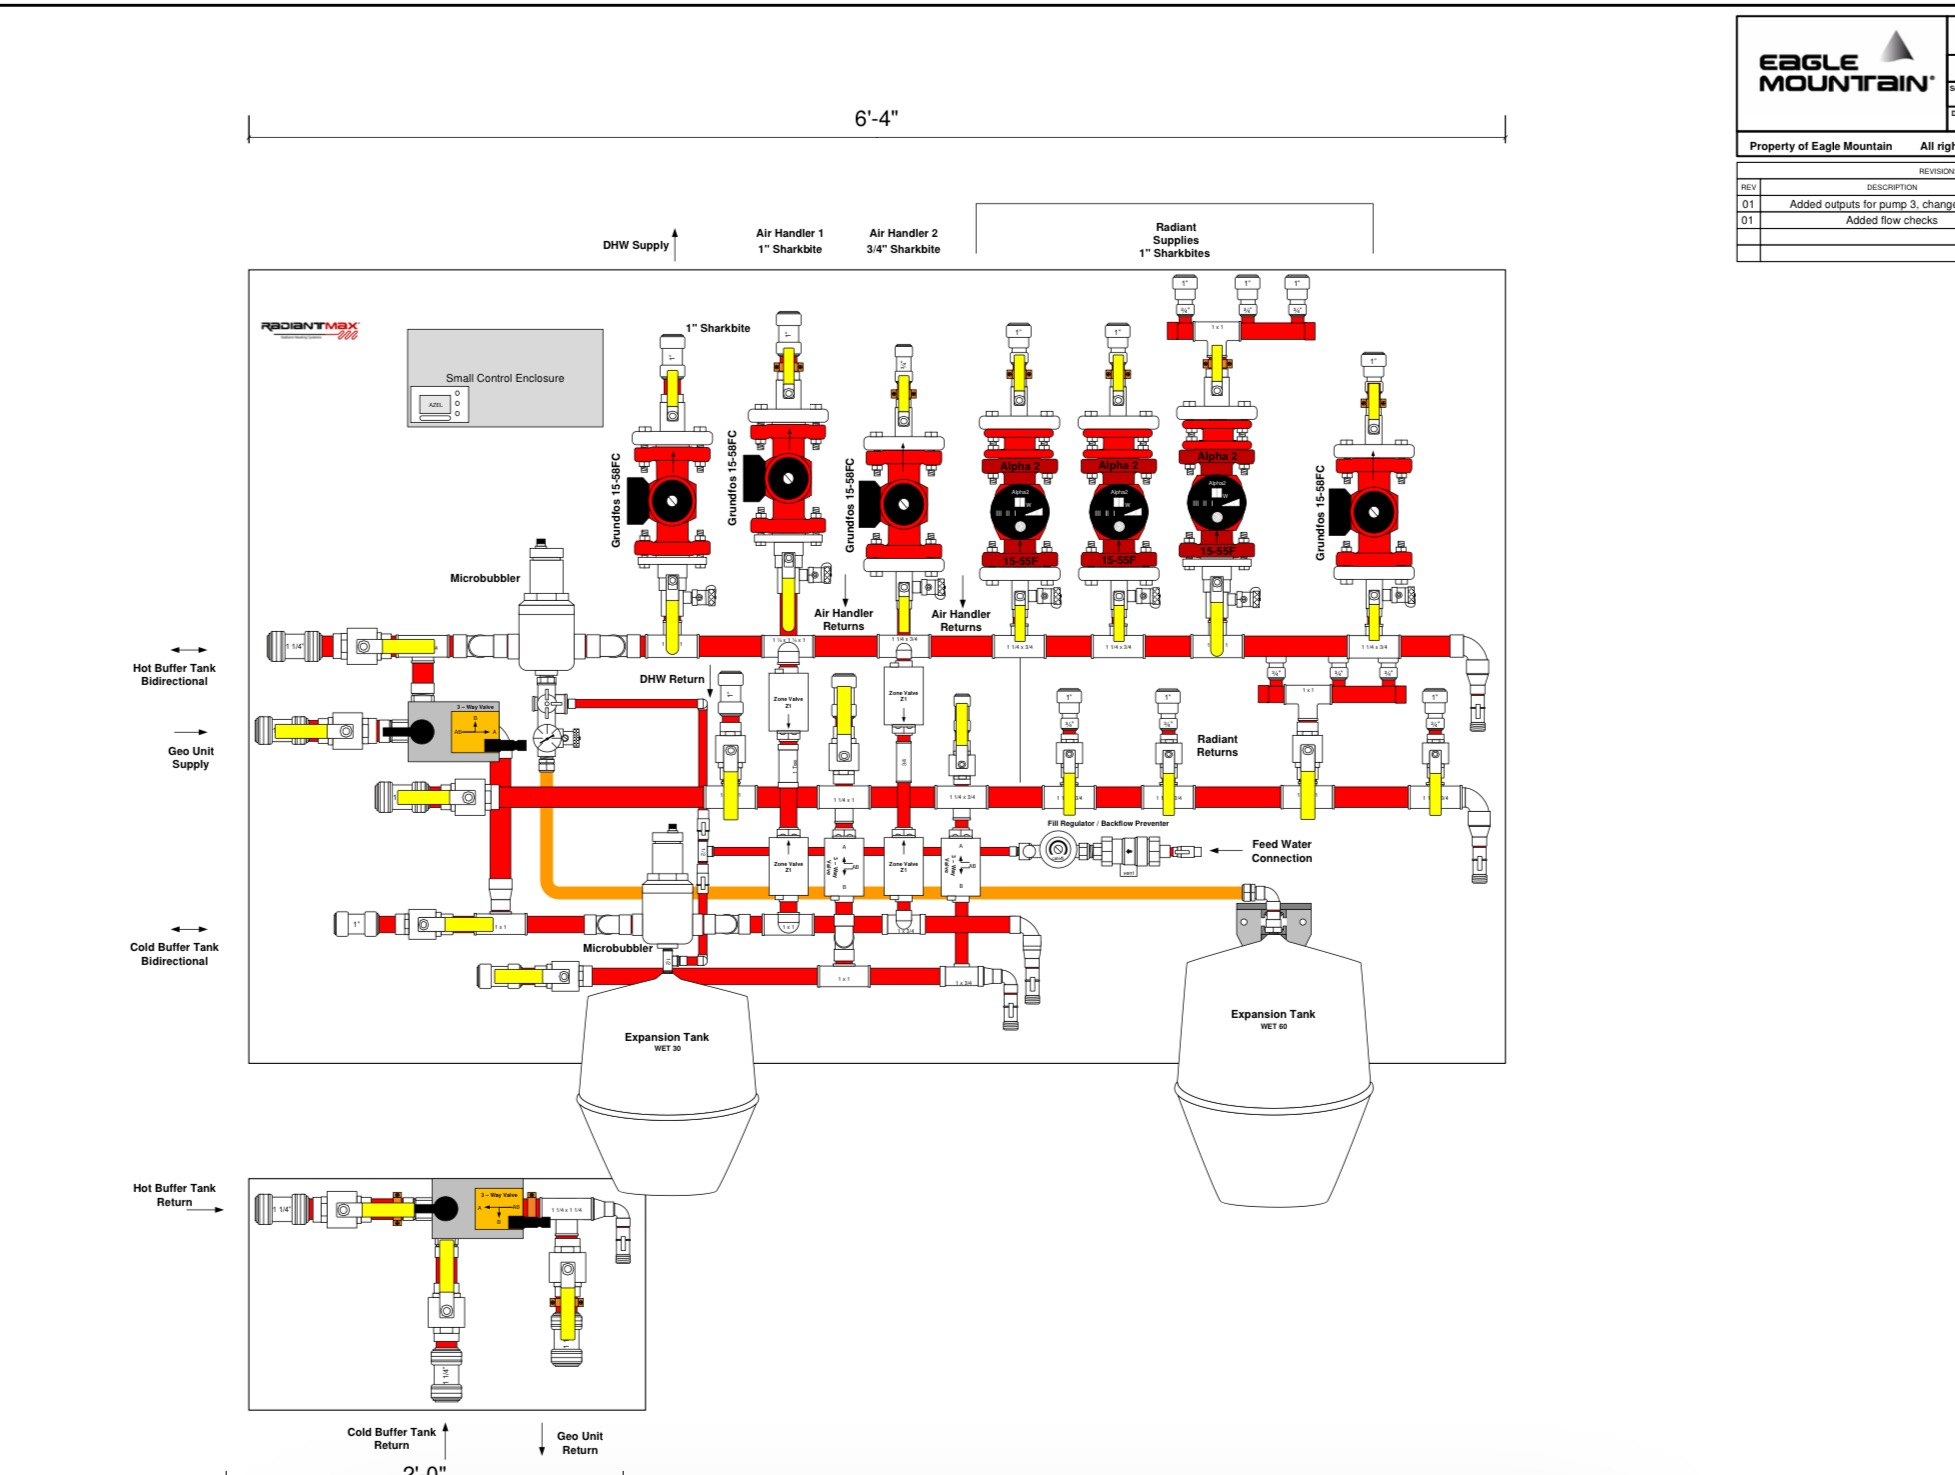 6CF8F0A4-2FEA-4648-9F9C-64BD80D5B188.jpeg